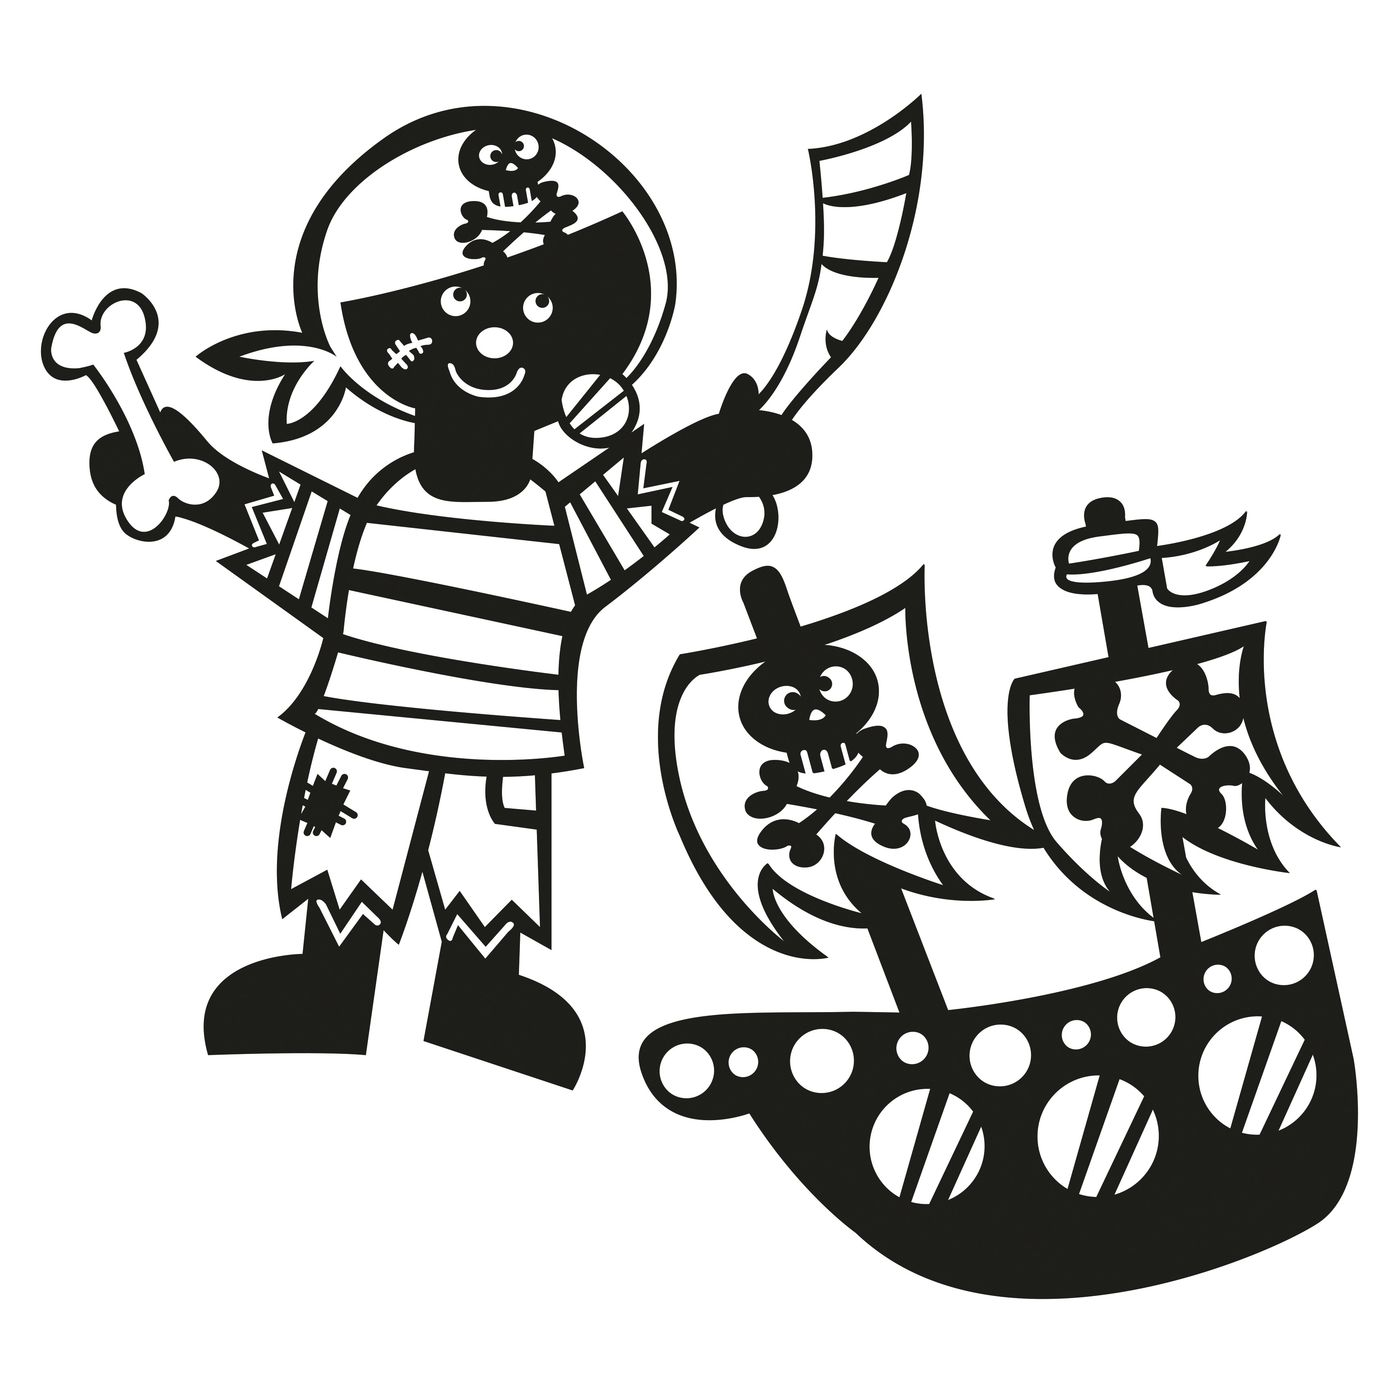 Sprühschablonen JAKO‑O, 2 шт